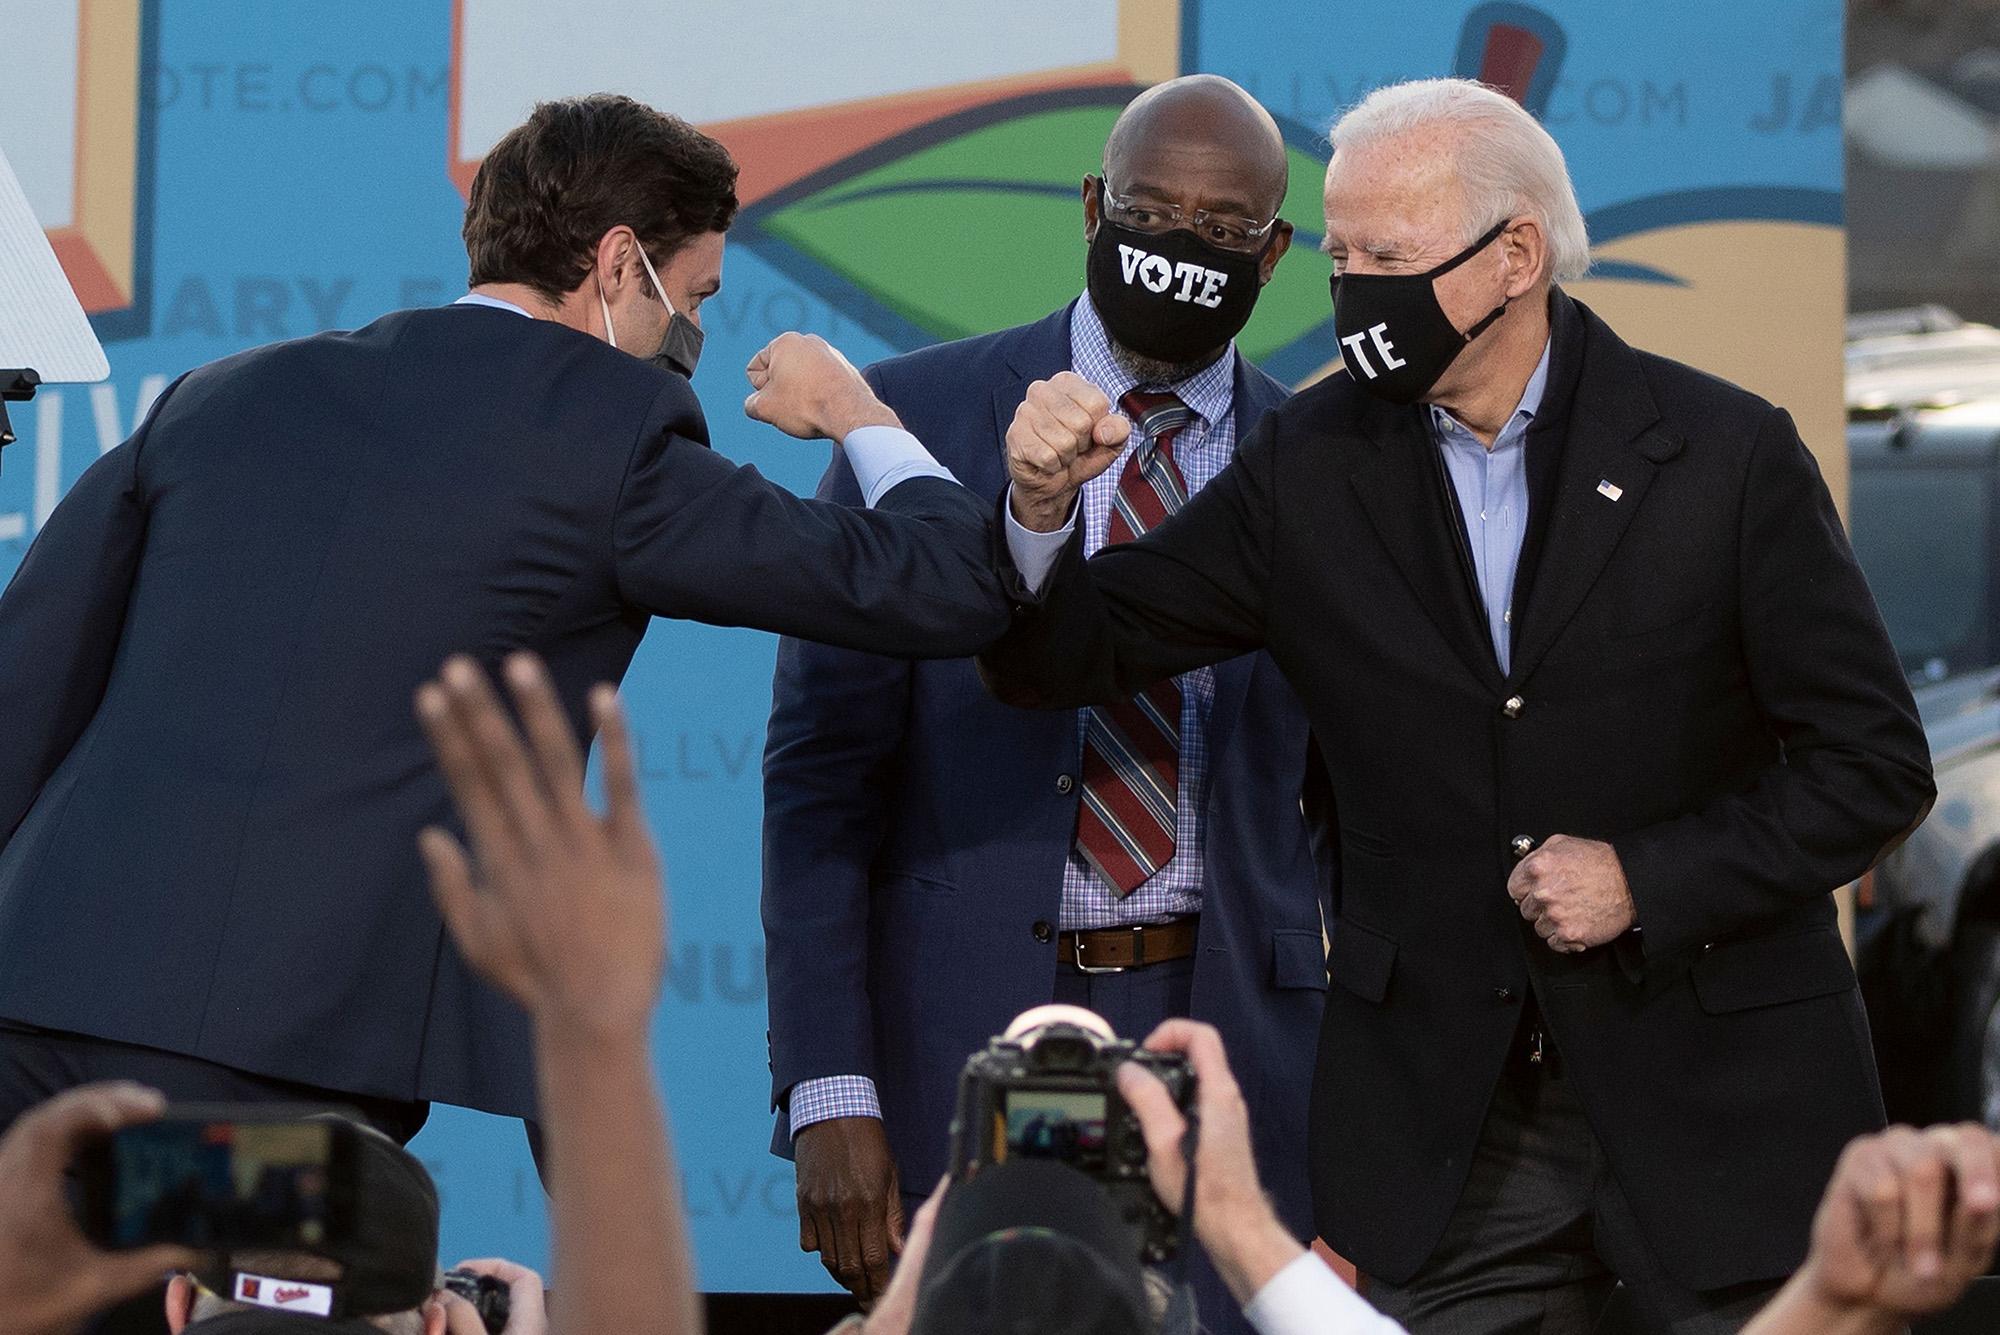 Democratic candidates for Senate Jon Ossoff, Raphael Warnock, and U.S. President-elect Joe Biden bump elbows on stage during a rally outside Center Parc Stadium in Atlanta, Georgia, on January 4.